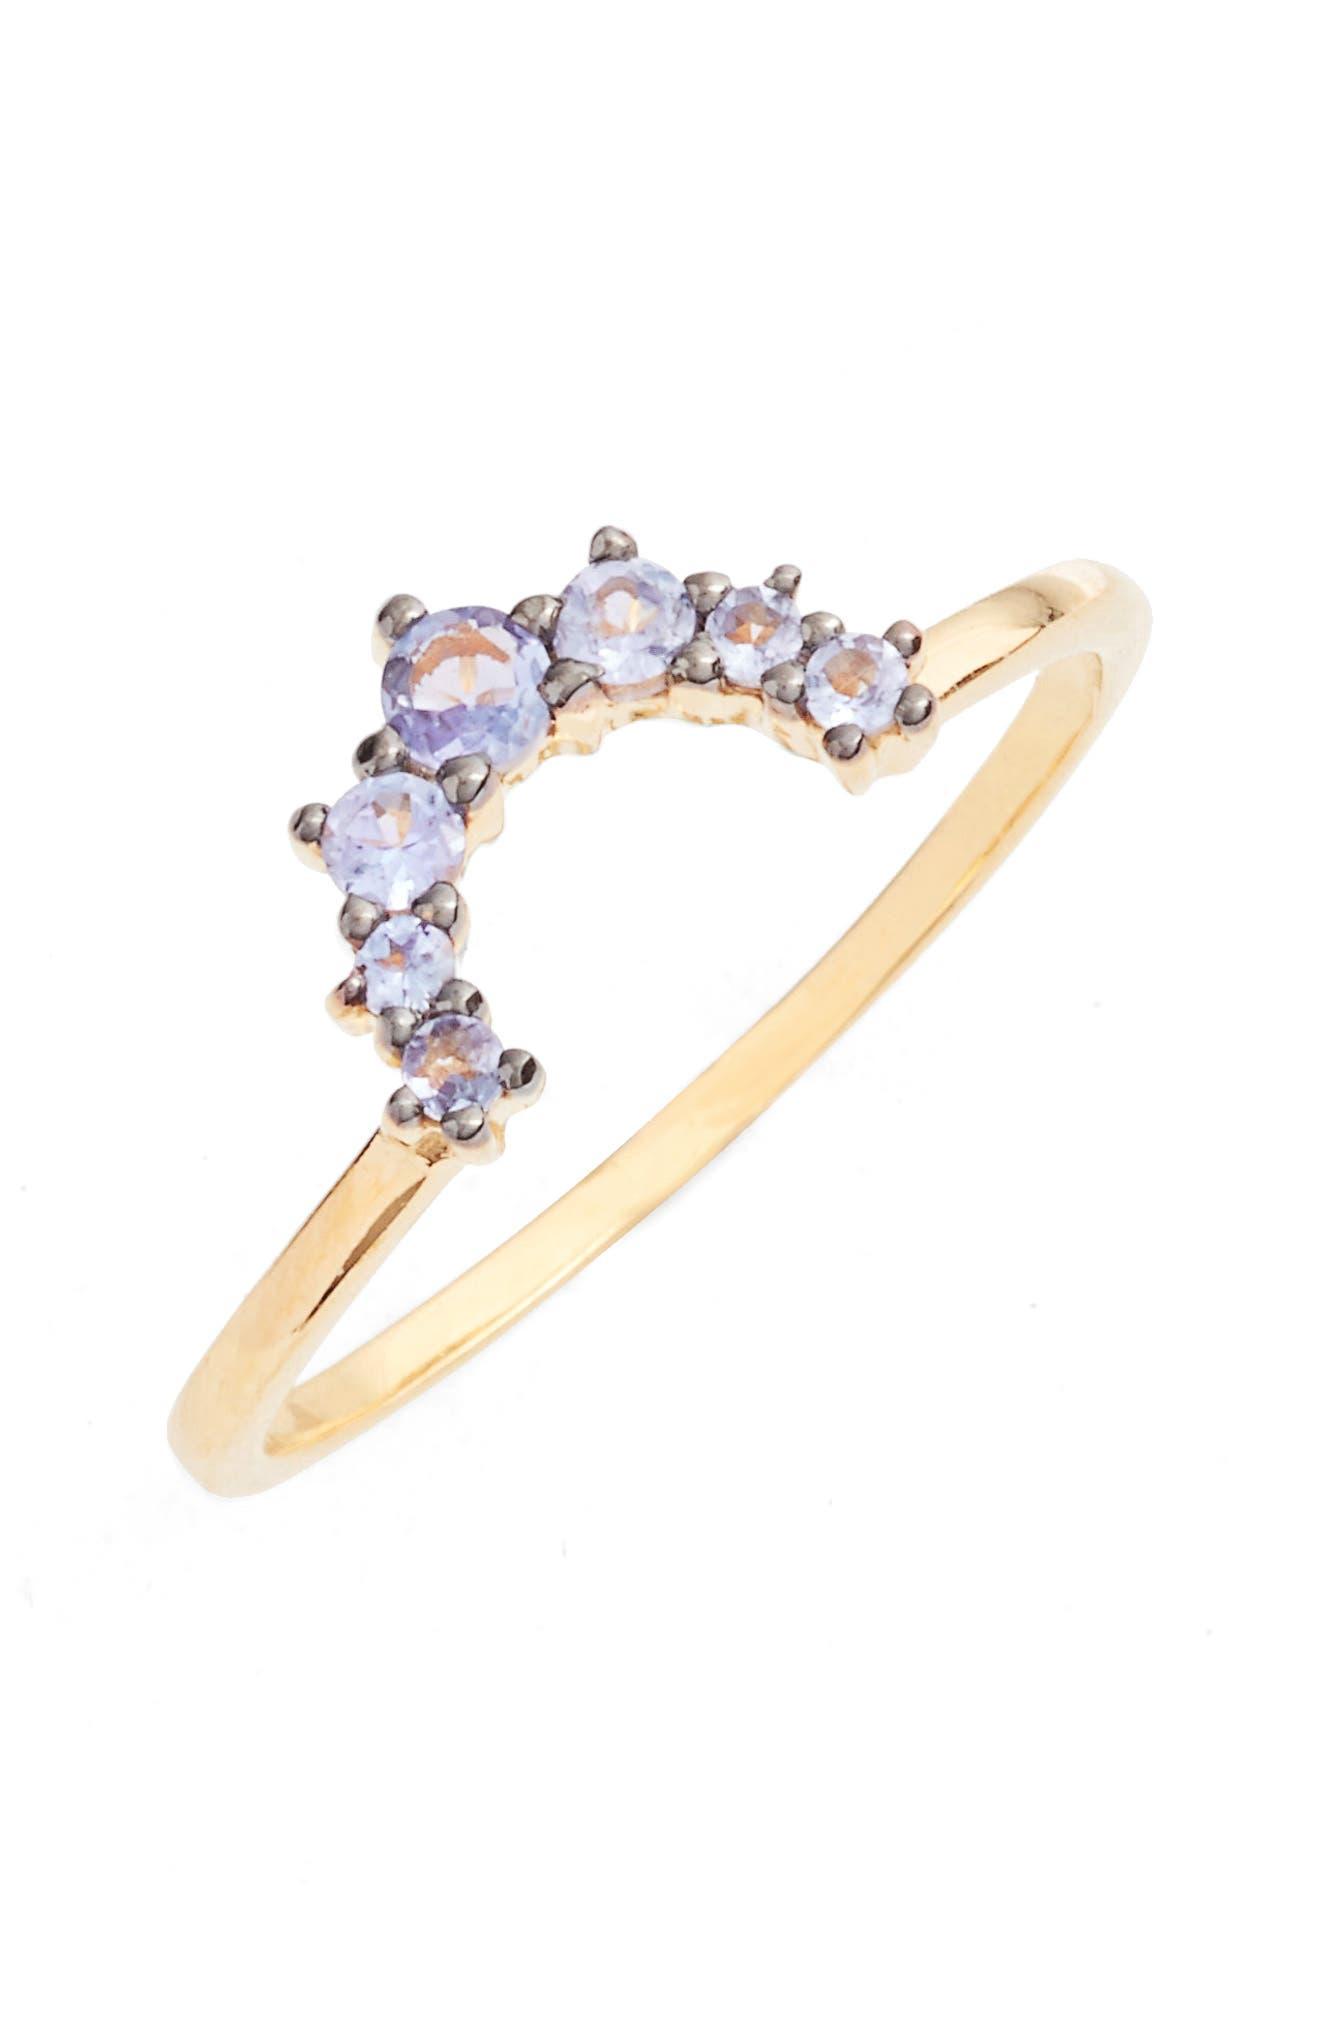 Main Image - Leah Alexandra Crescent Ring